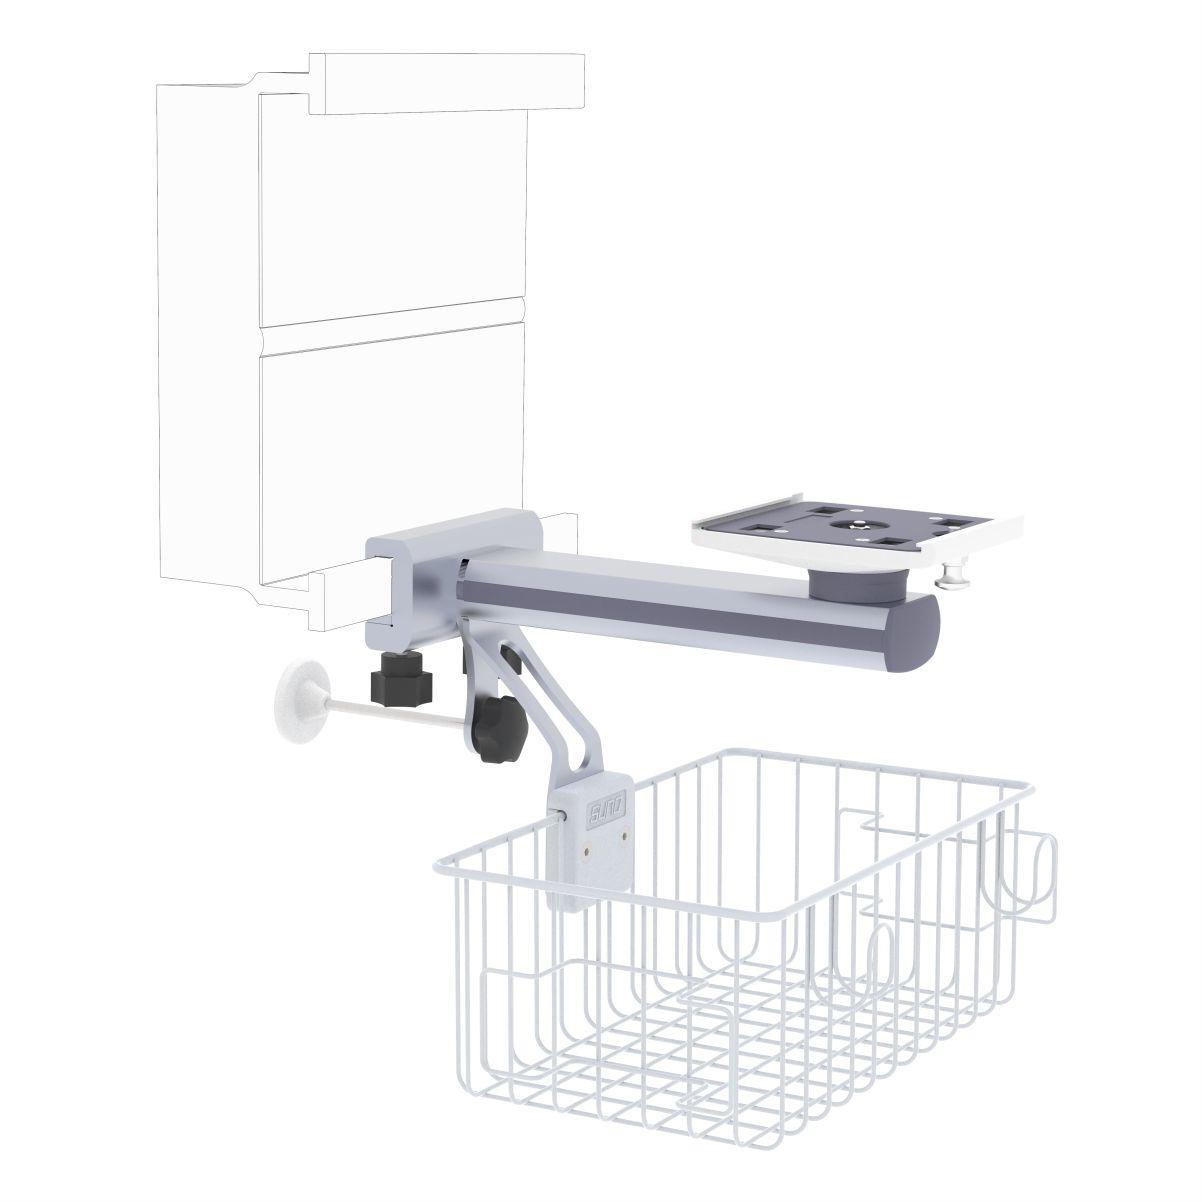 Medical Monitor Mounting